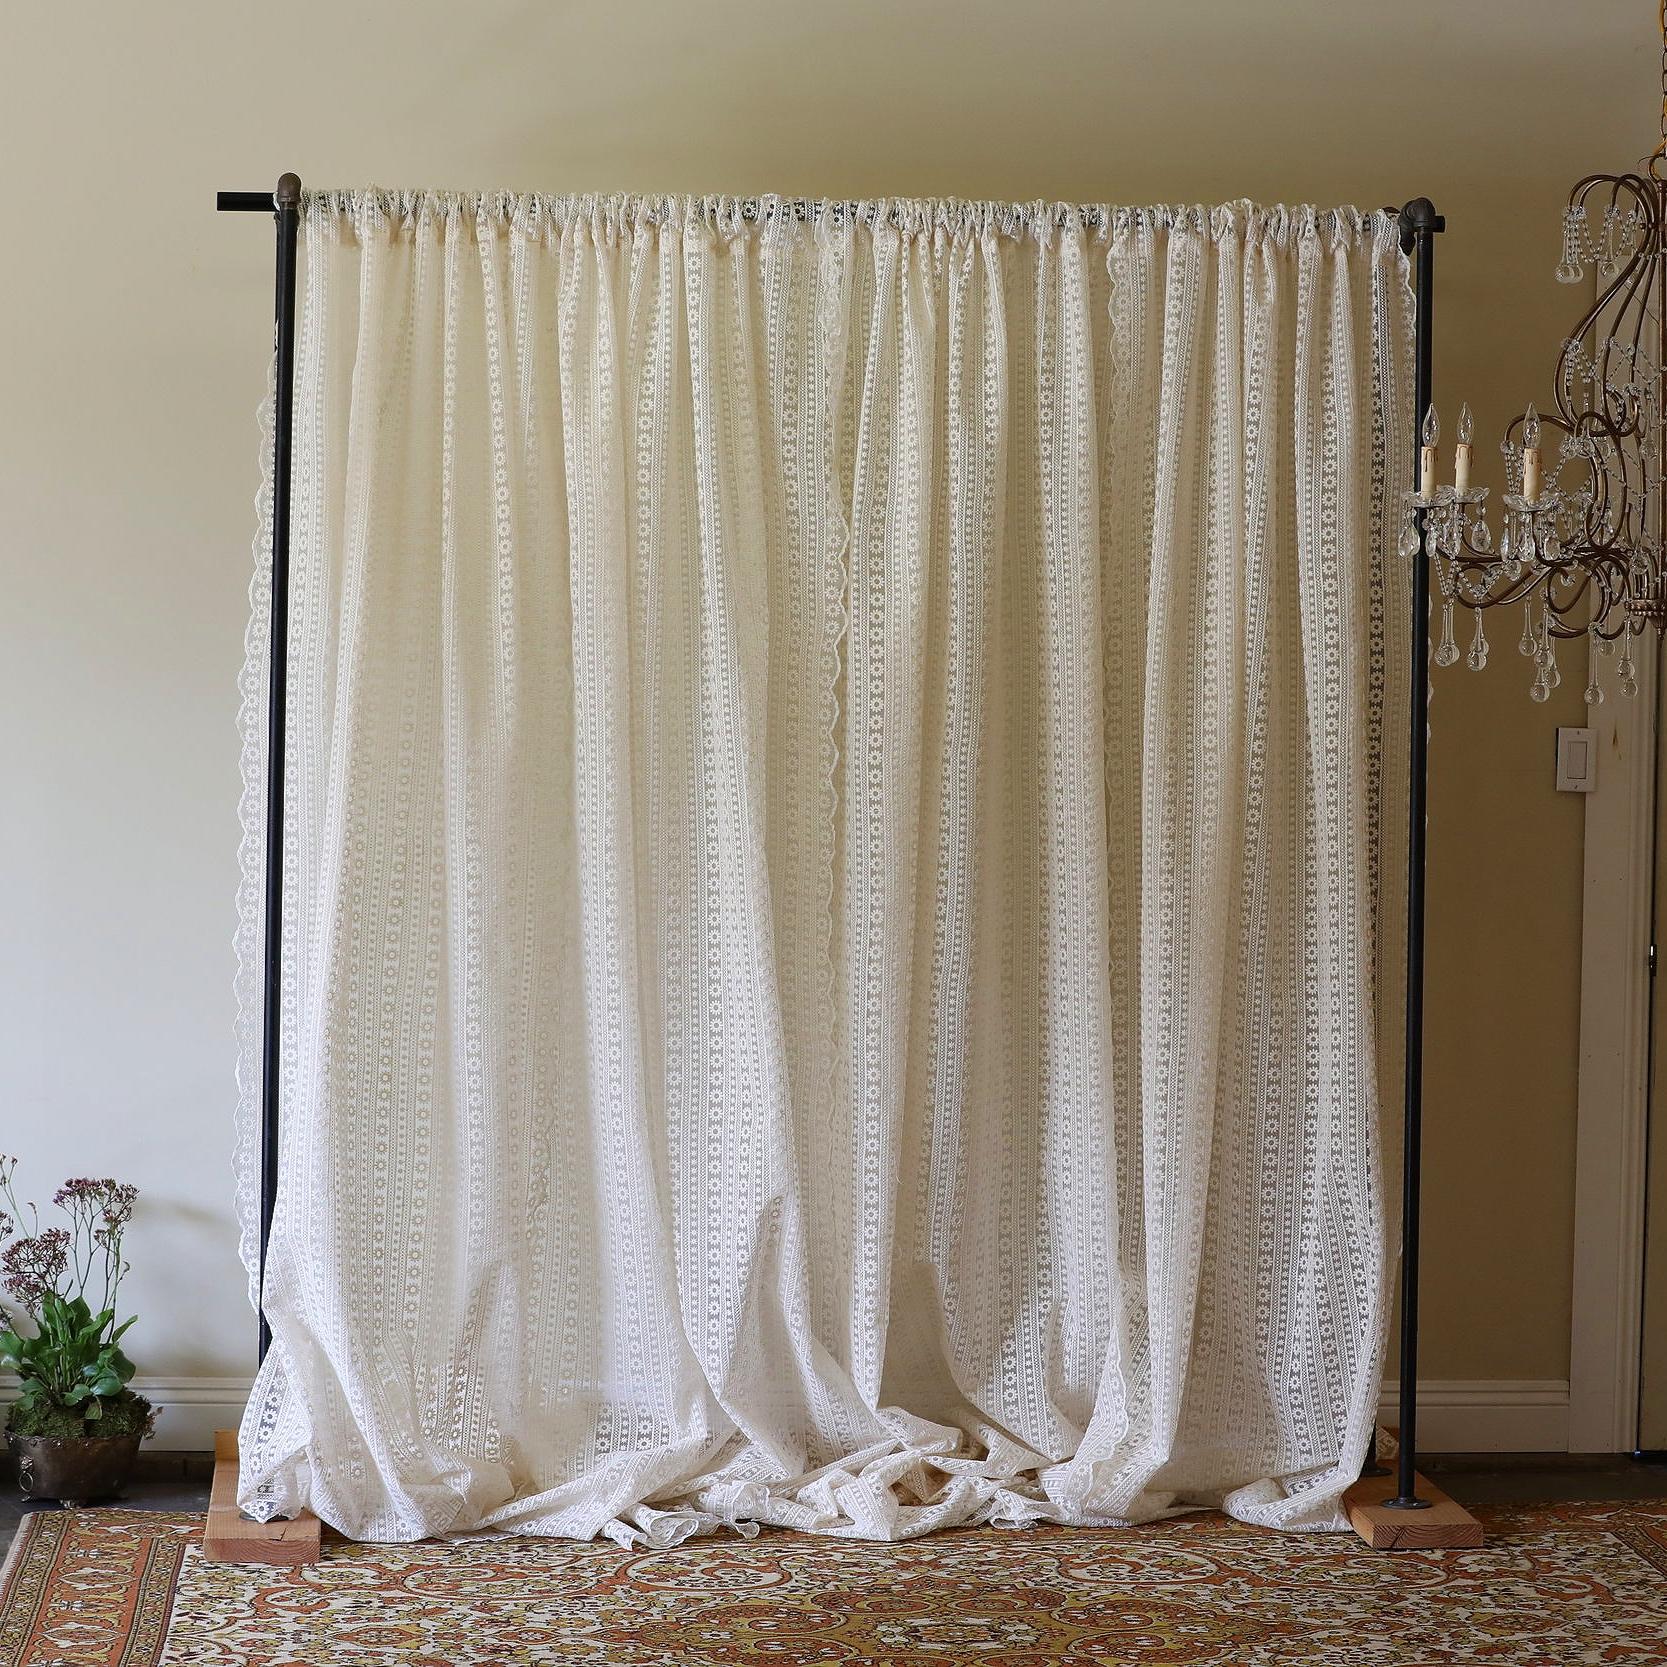 curtain+backdrop.jpg